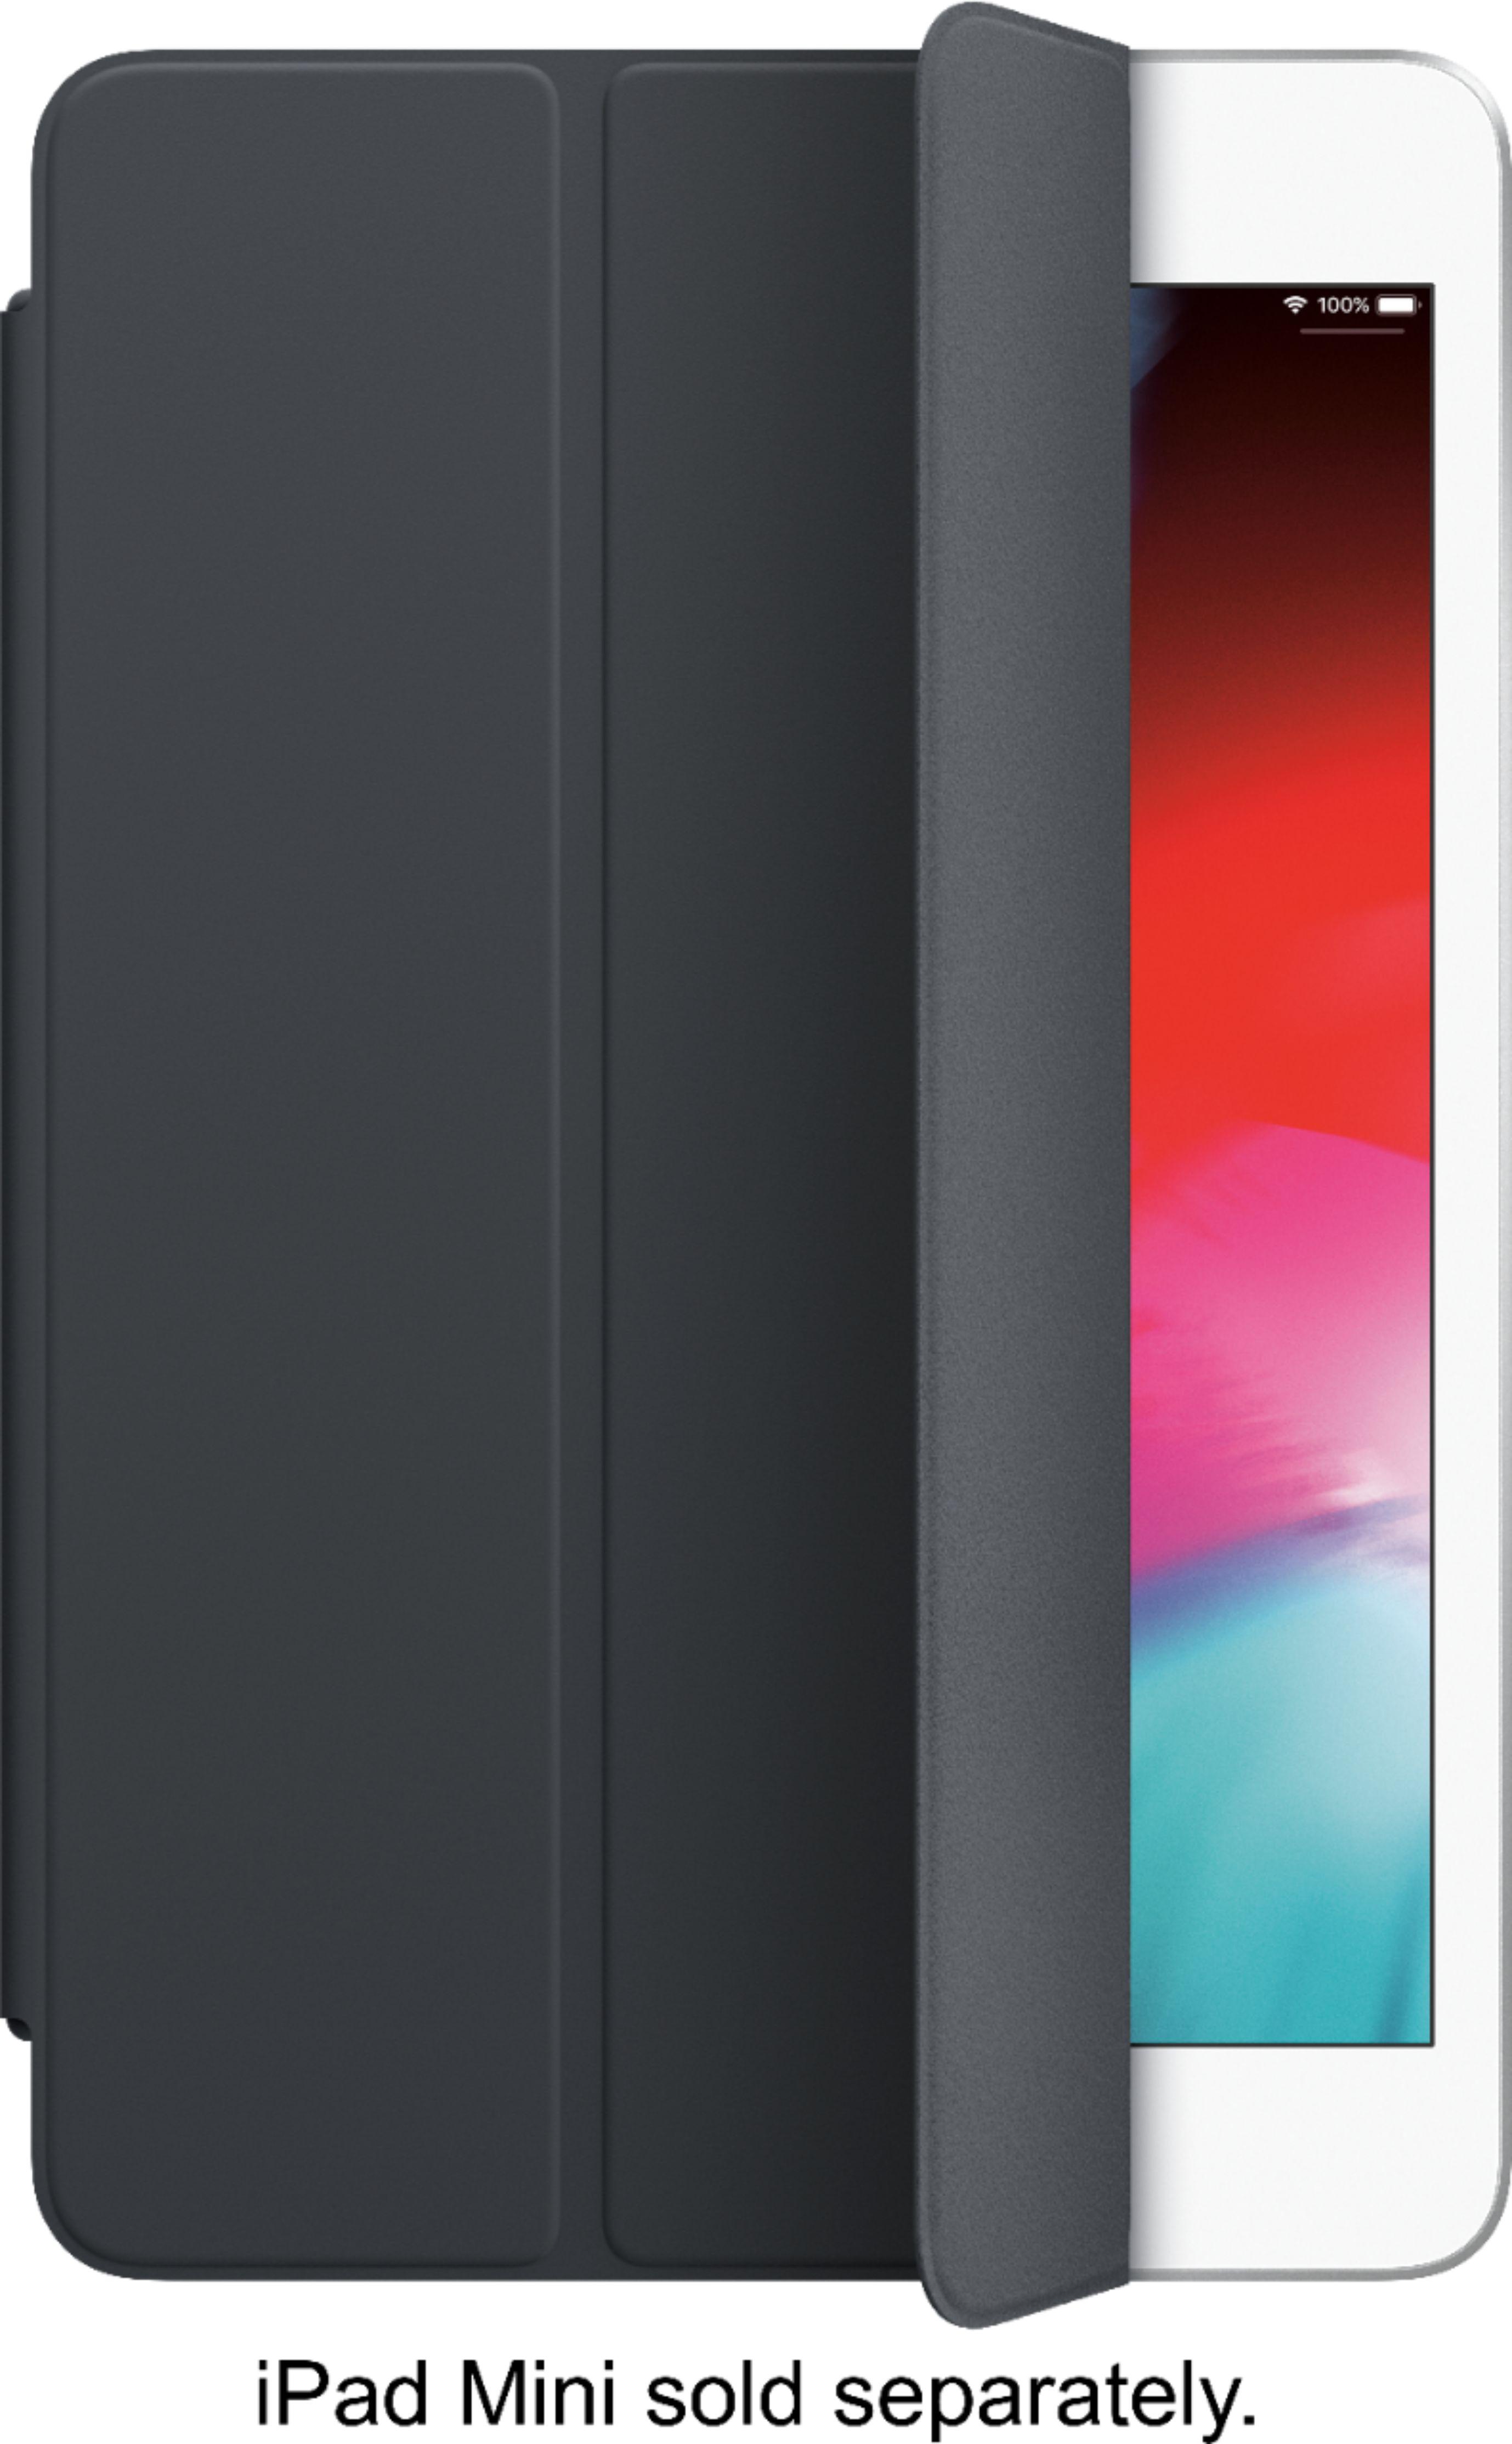 Apple Smart Cover for Apple iPad mini (Latest Model) and mini 4 - Charcoal Gray